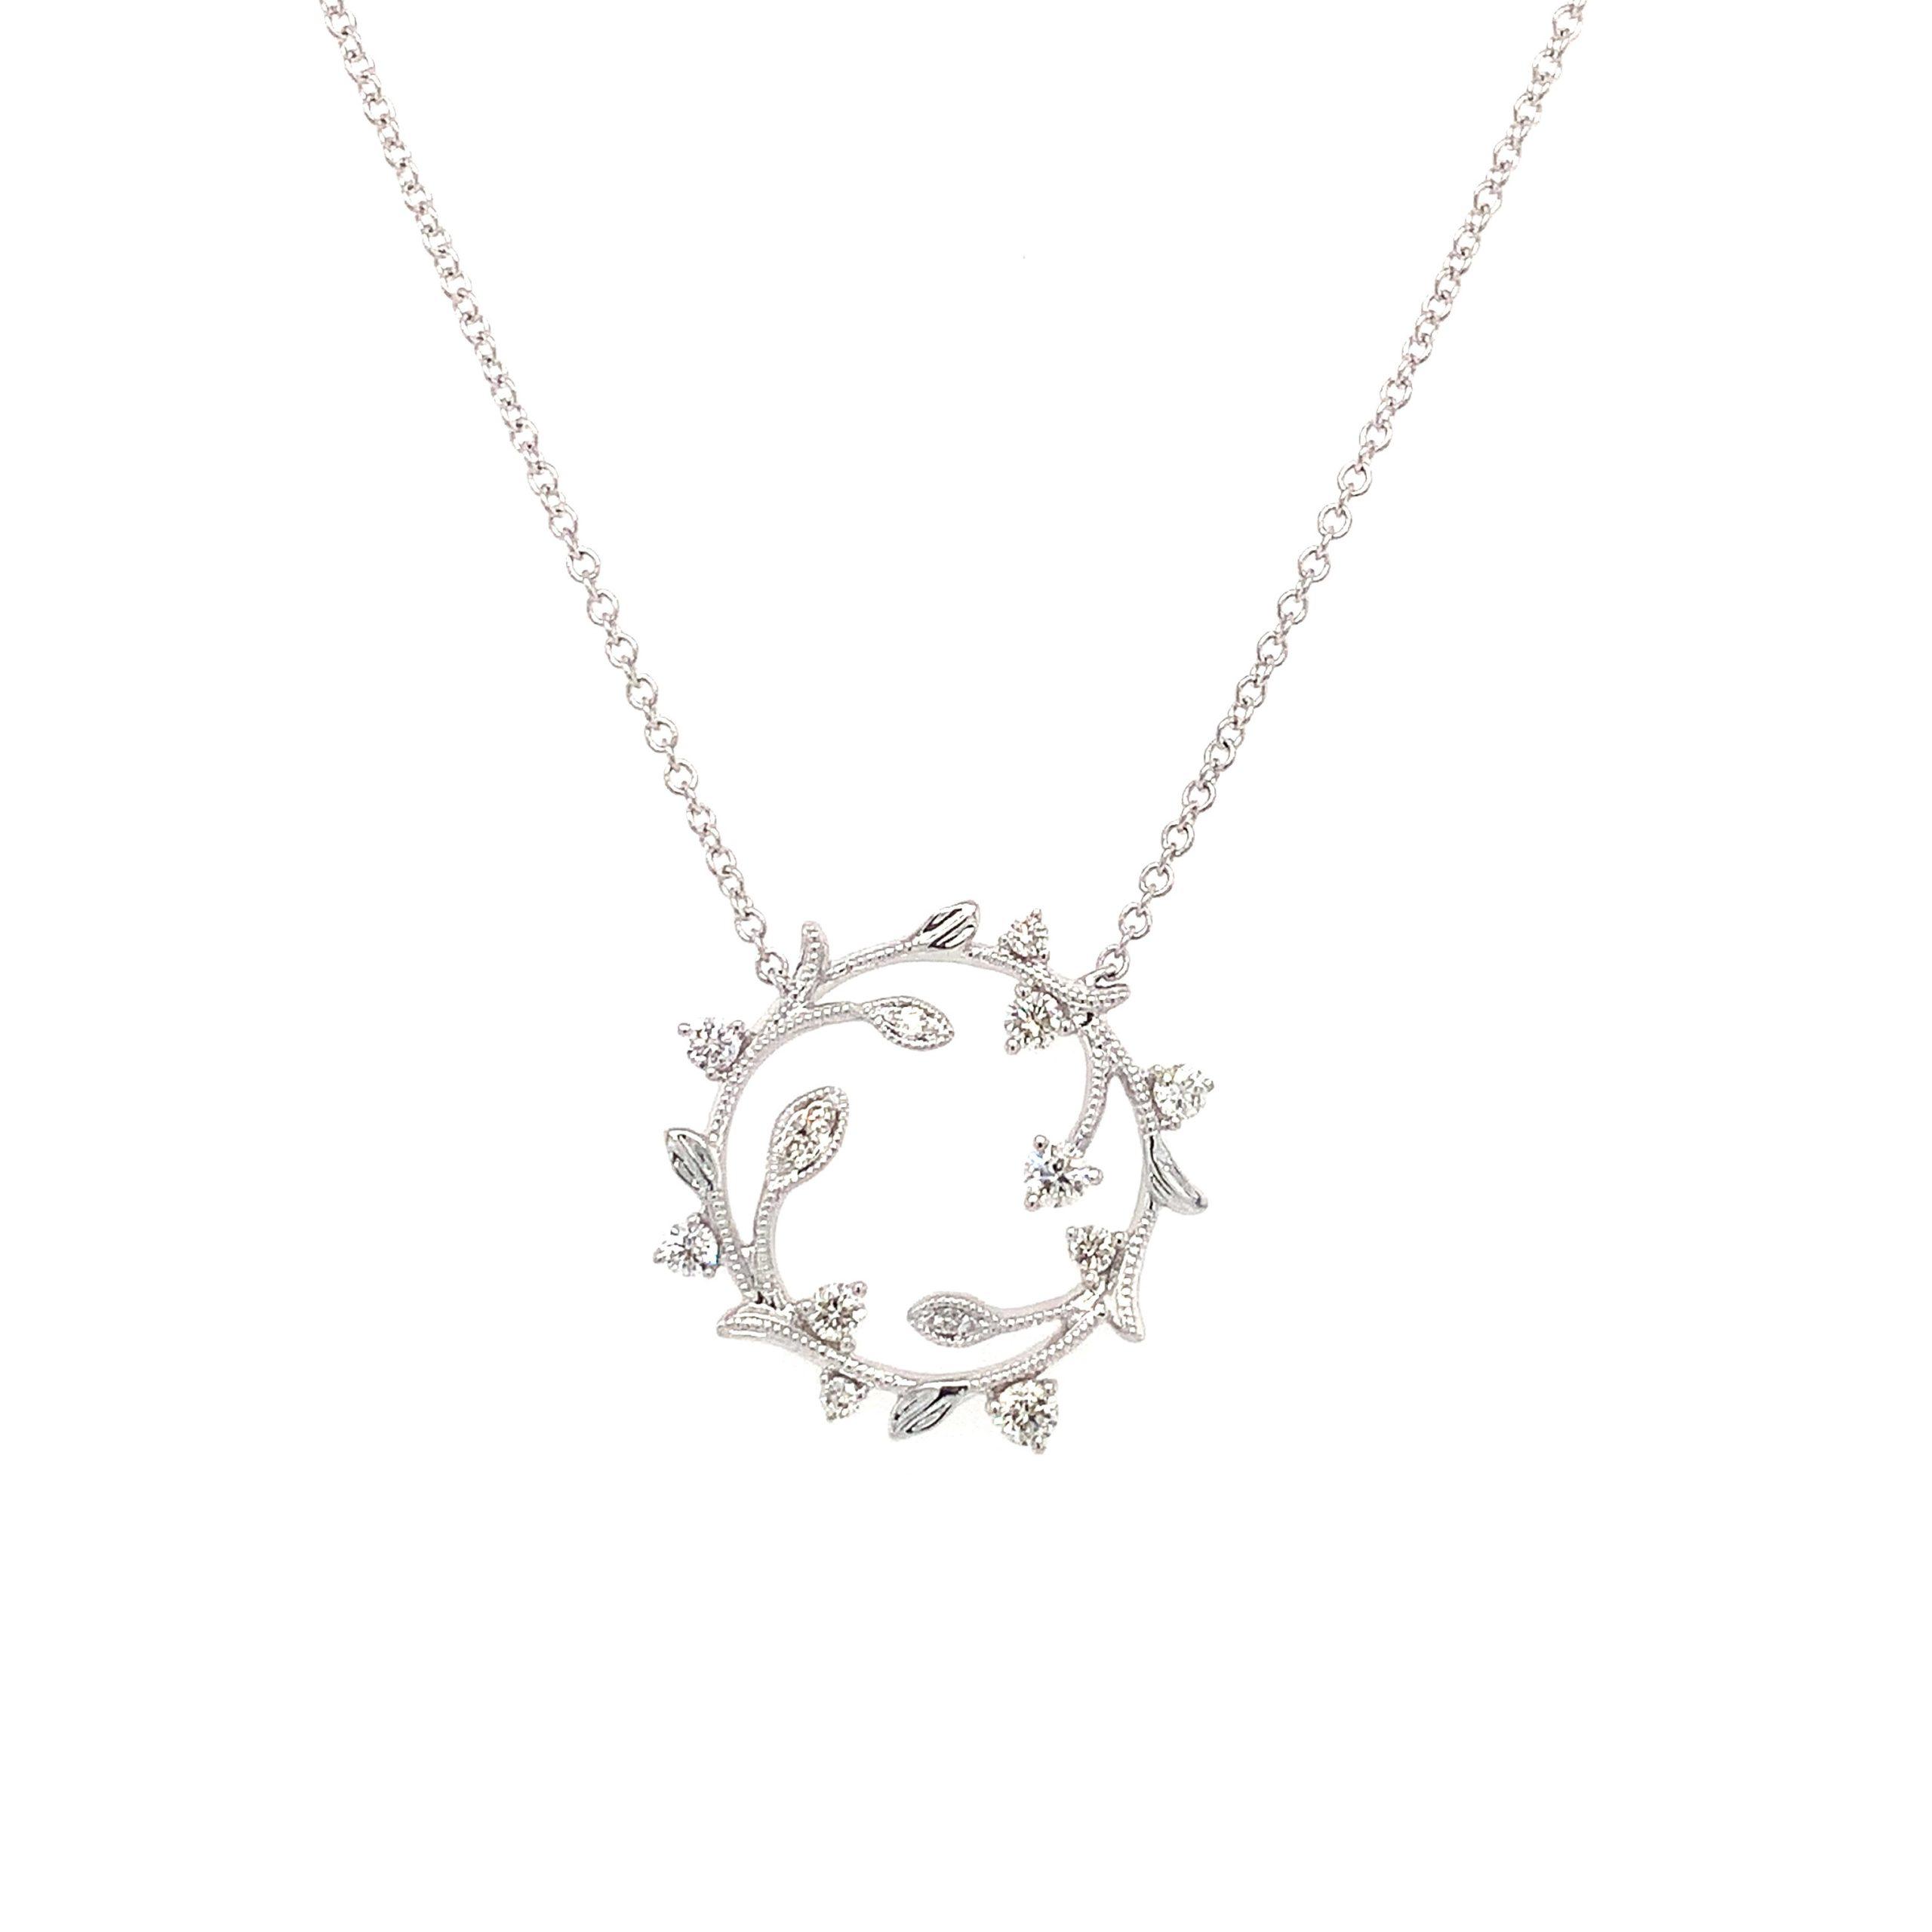 White Gold Diamond Wreath Pendant Necklace